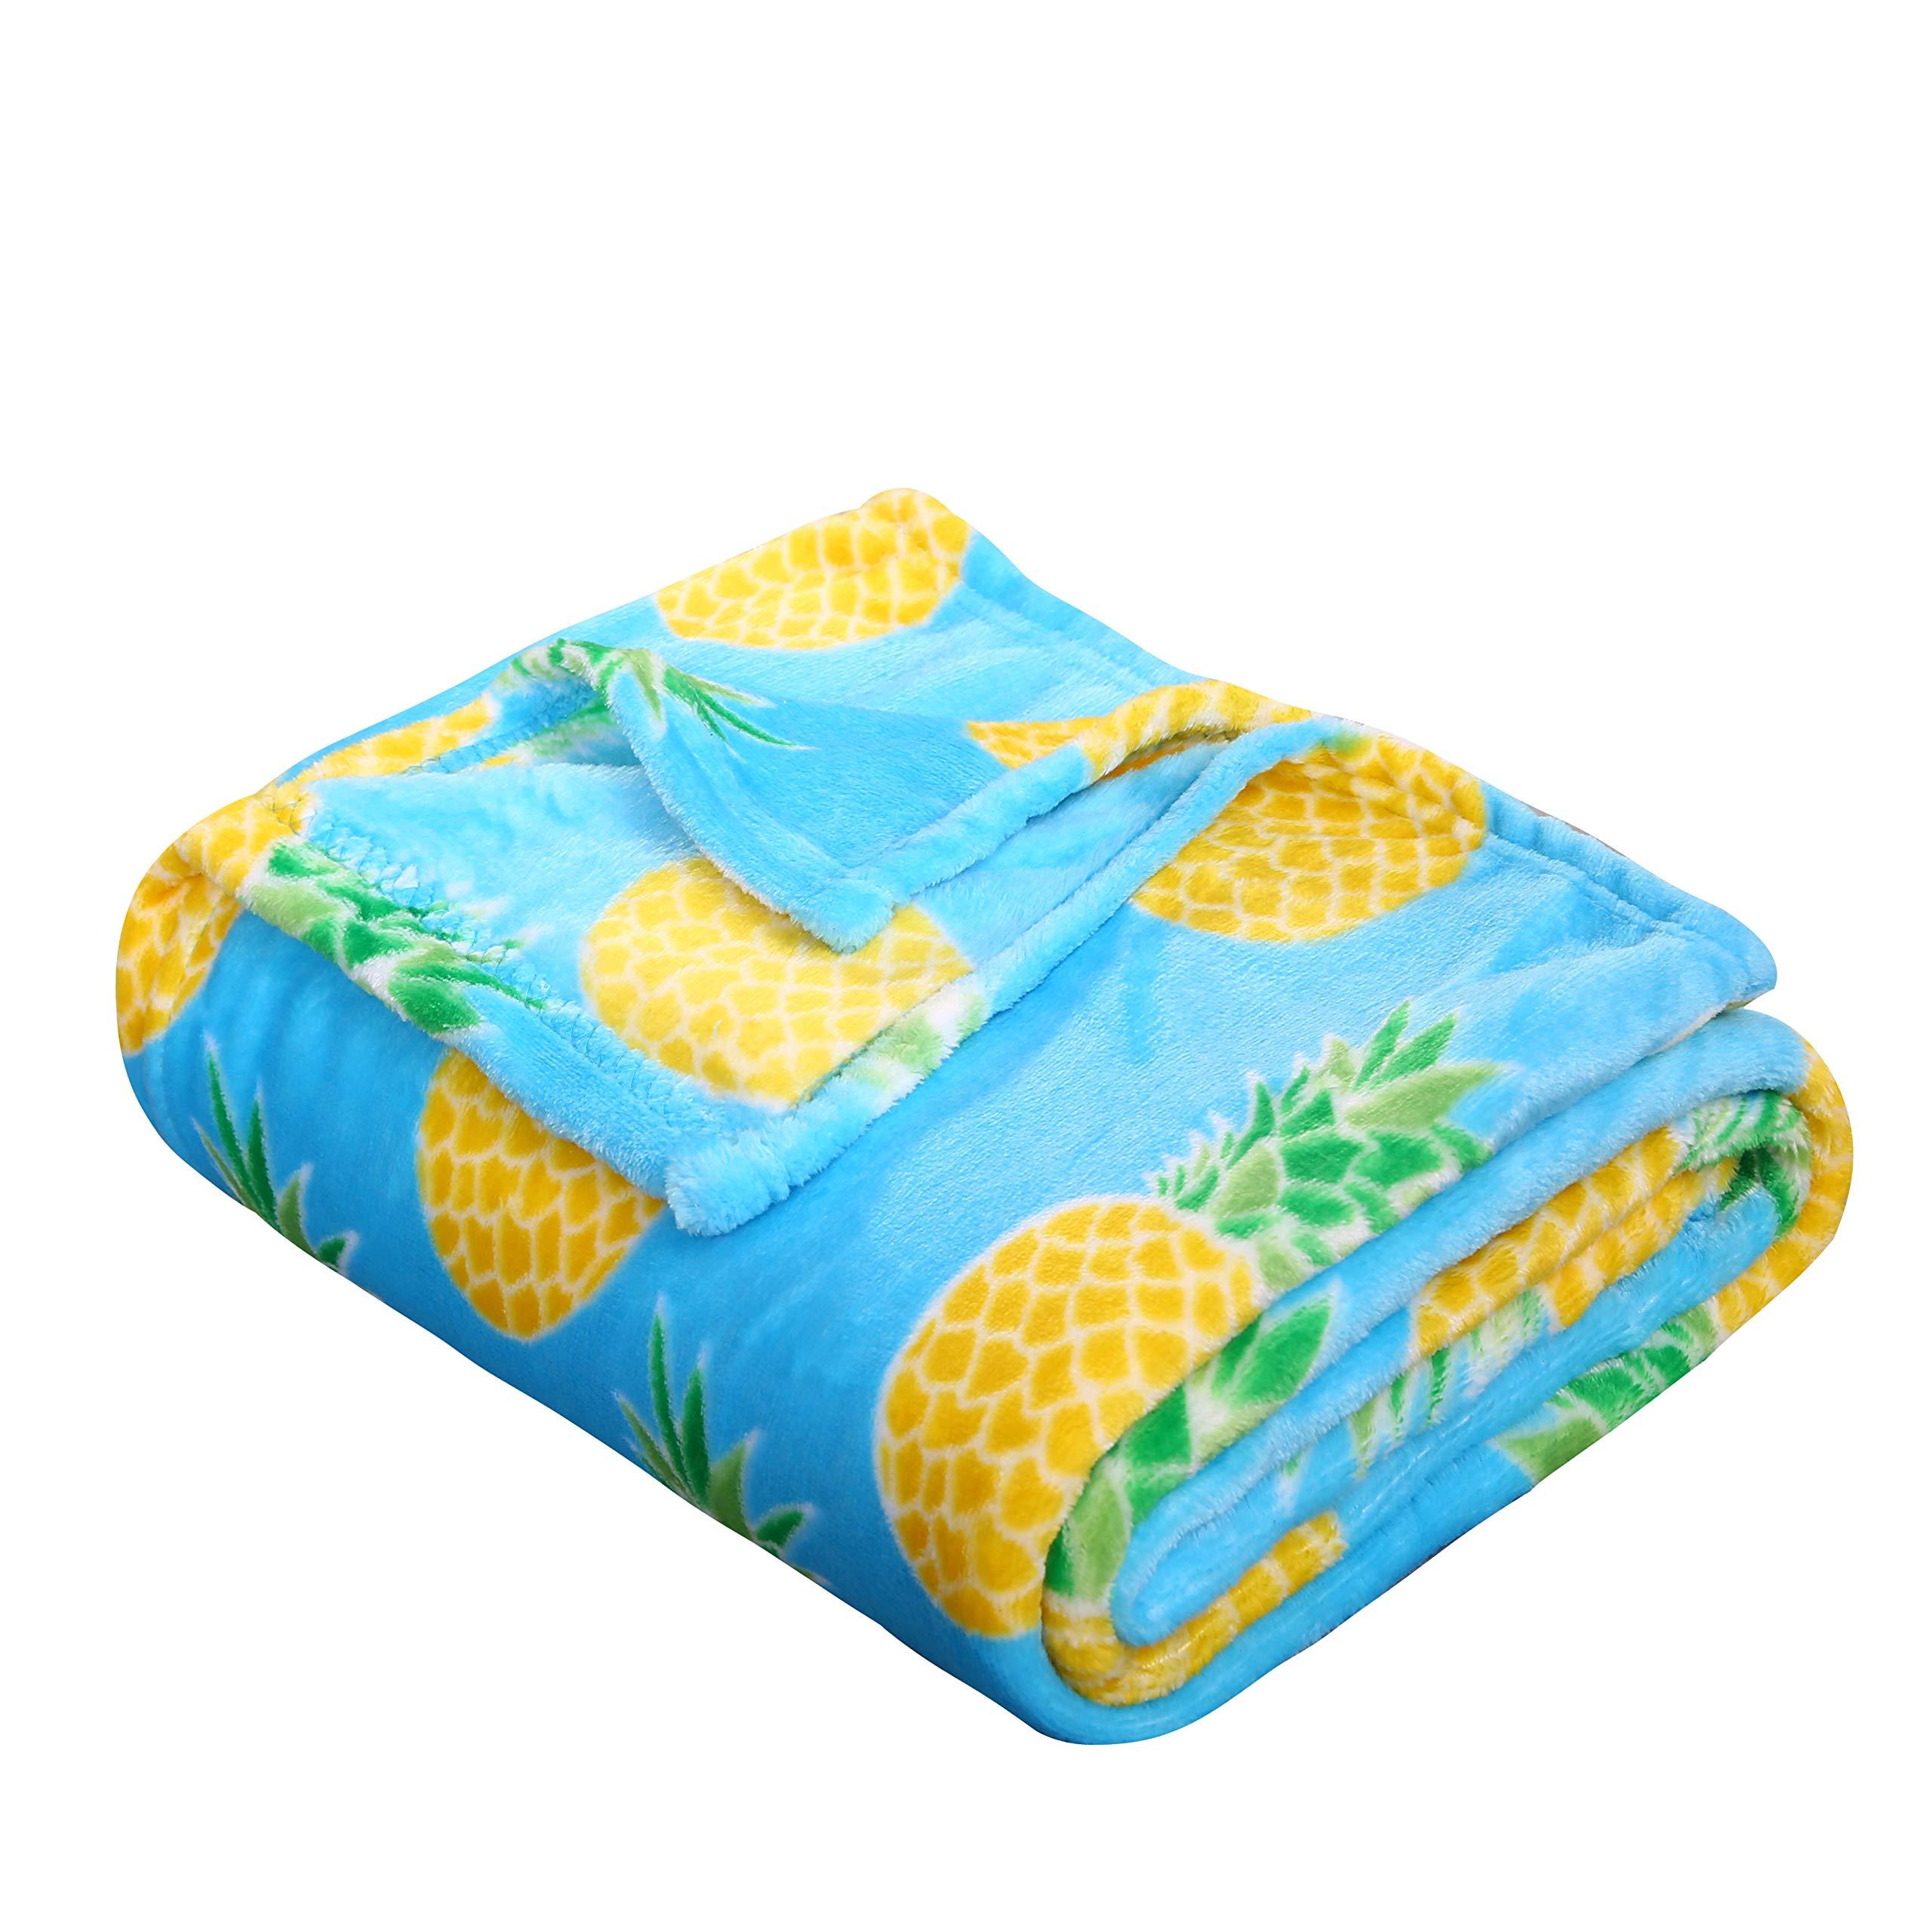 SummerTime Whimsy Plush Fleece Throw Blanket (50'' x 60'') - Pineapple by Décor&More (Image #2)